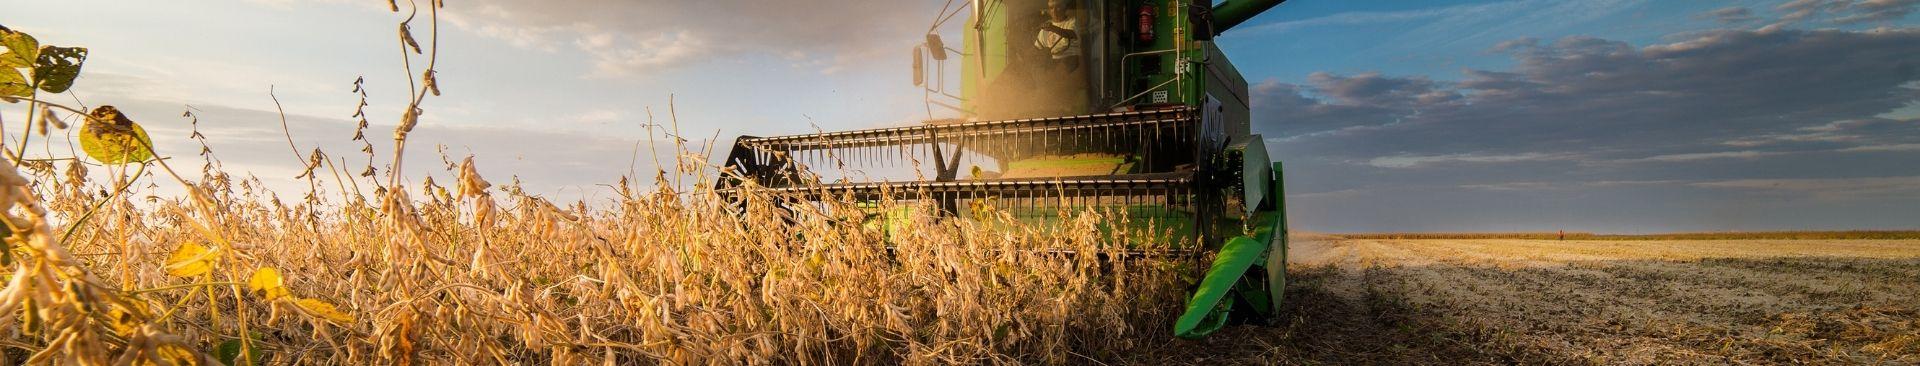 tractor harvesting field